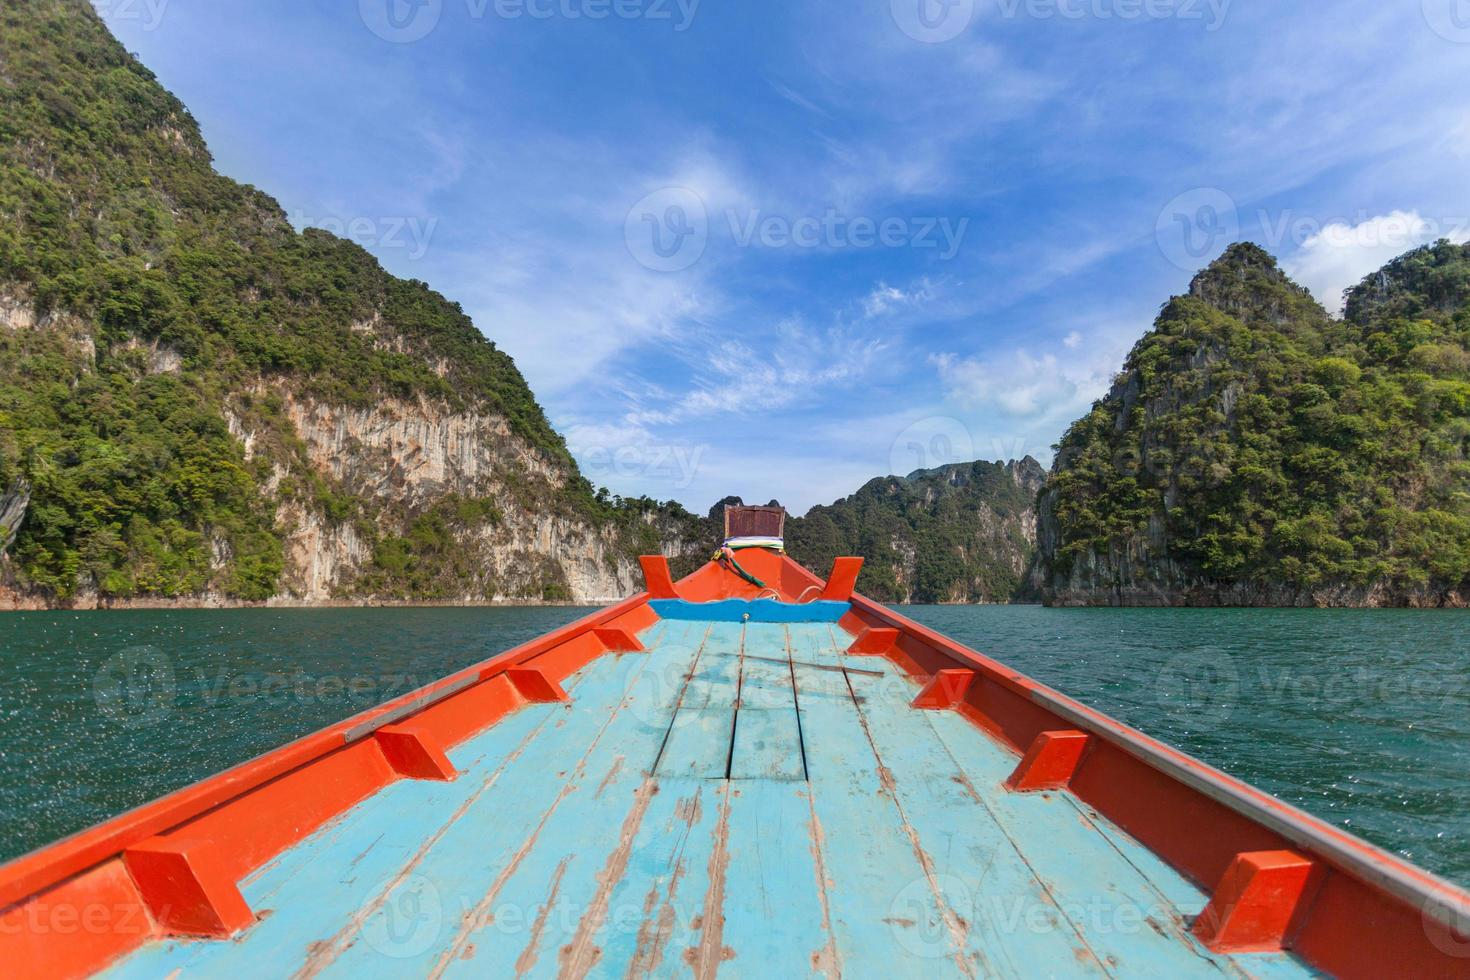 kleine boten in de ratchapaphadam, surat thaniprovincie, Thailand. foto